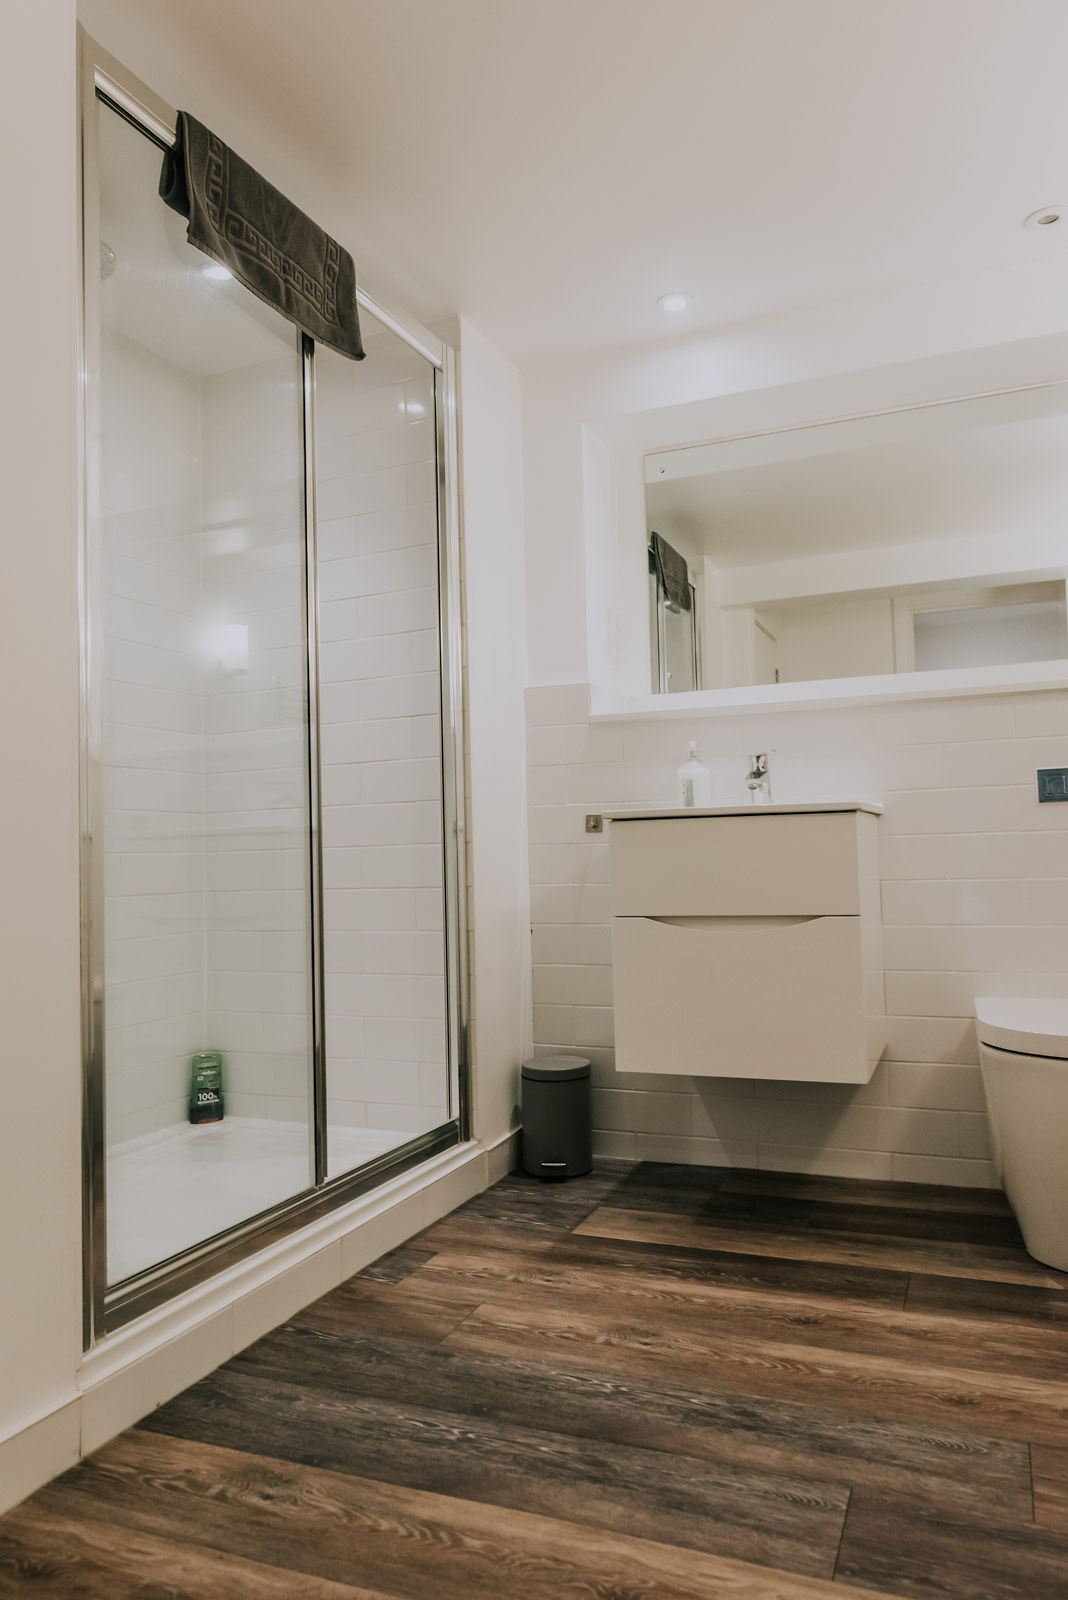 Bathroom at Cavendish House